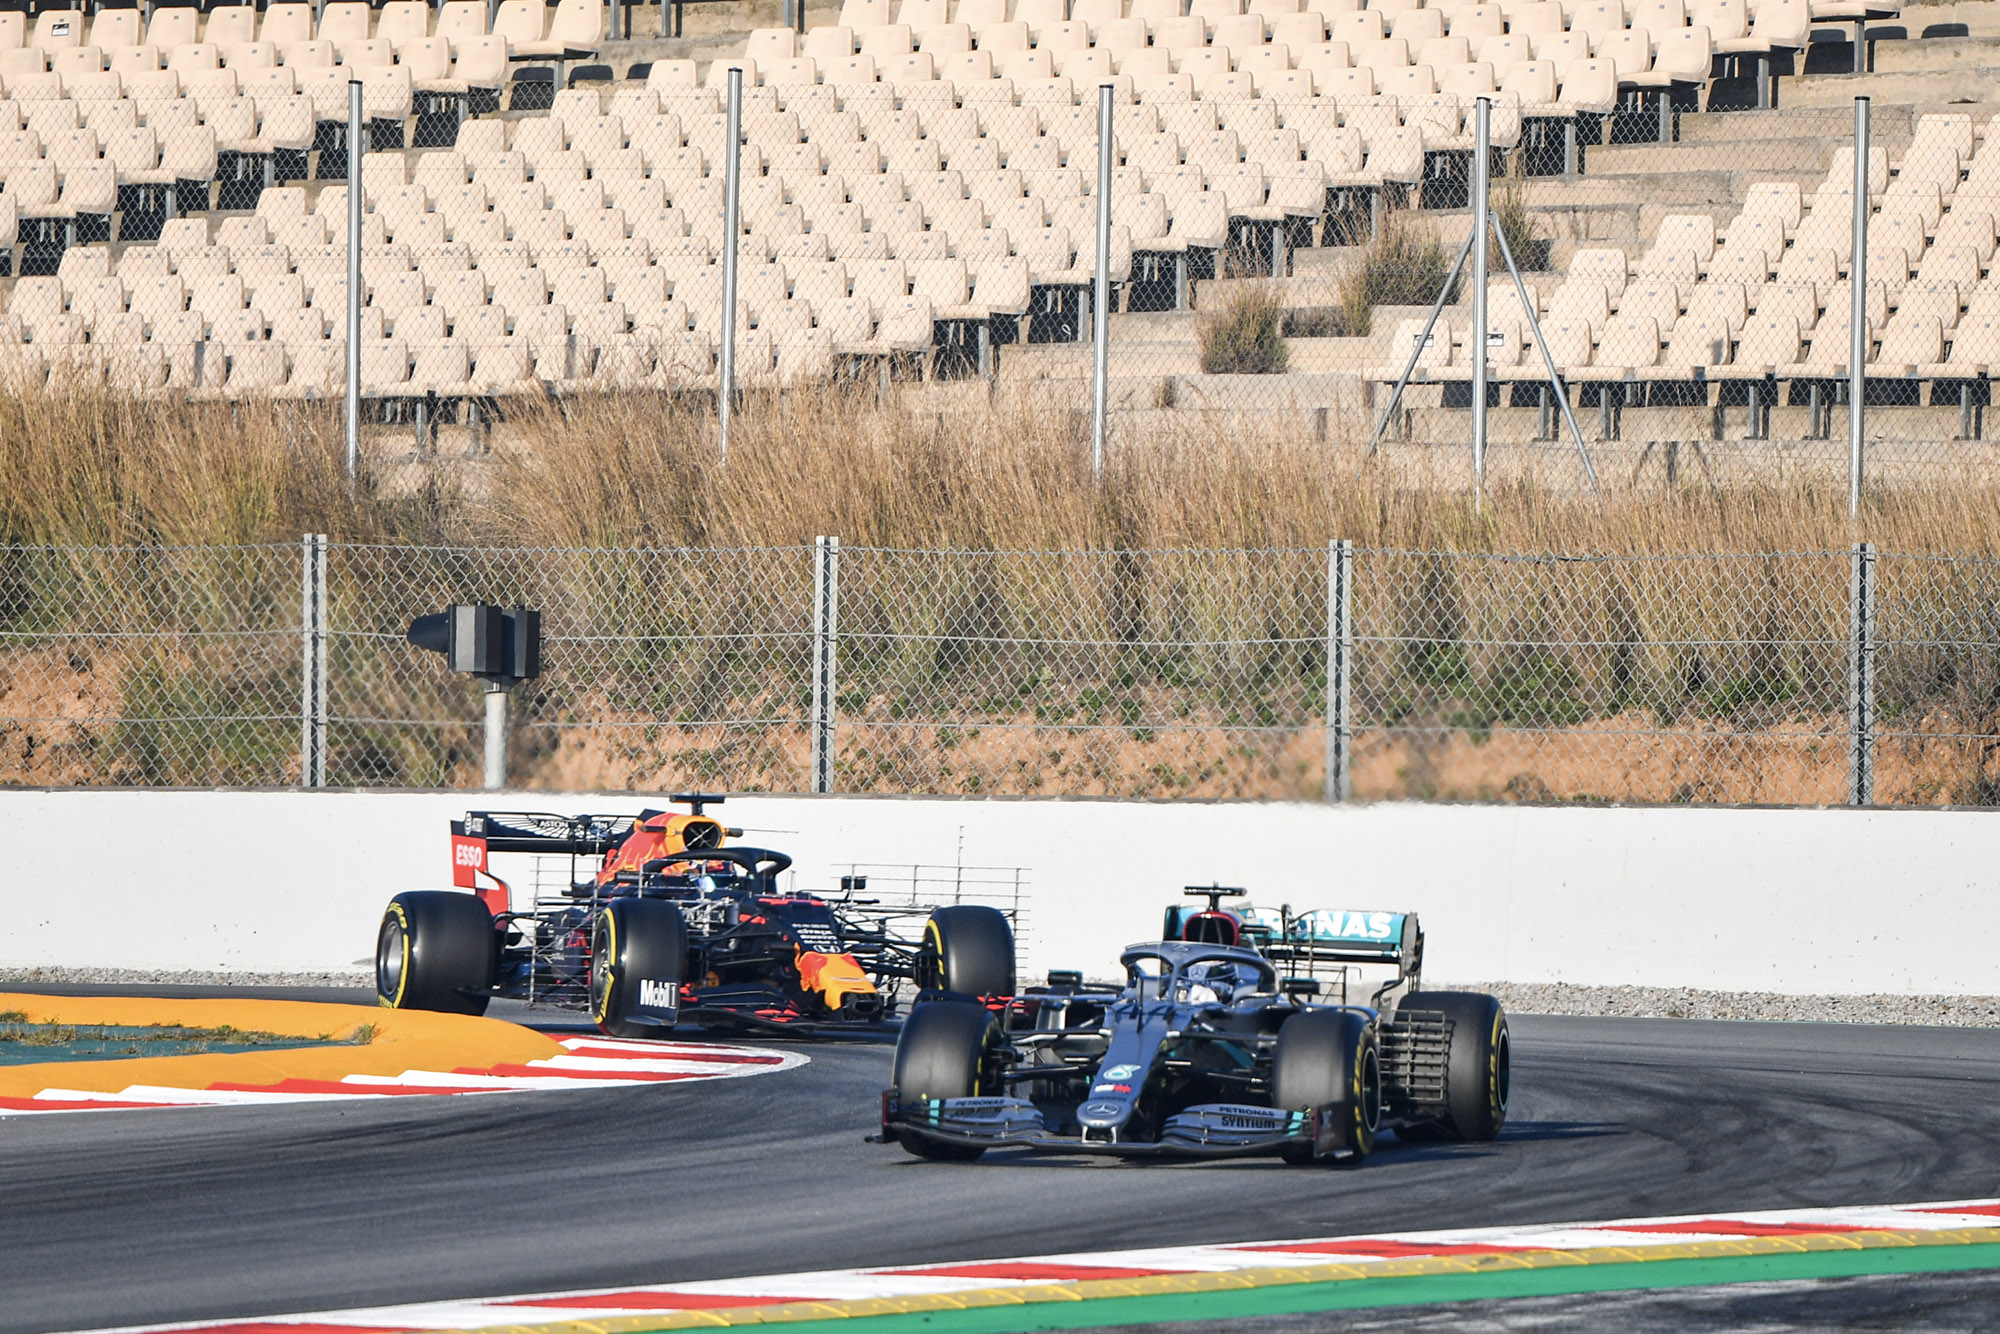 Red Bull follows Mercedes in 2020 f1 preseason testing